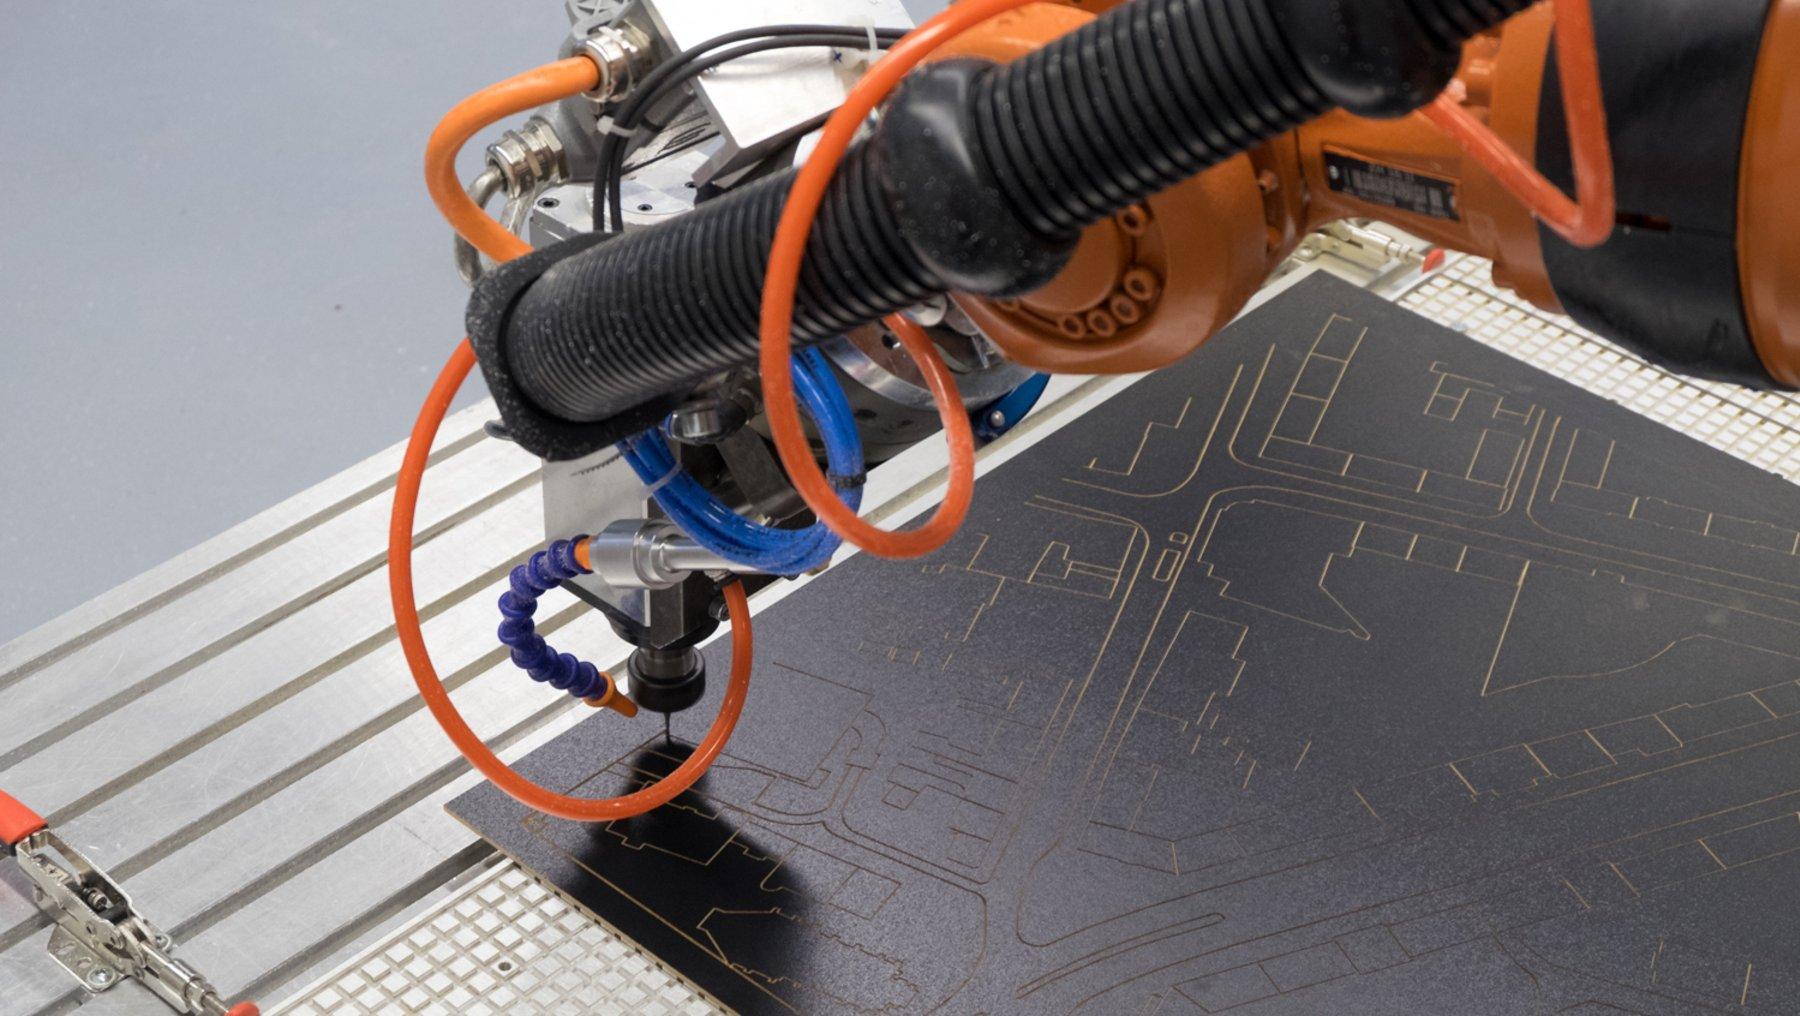 Materialspulen des 3D-Druckers